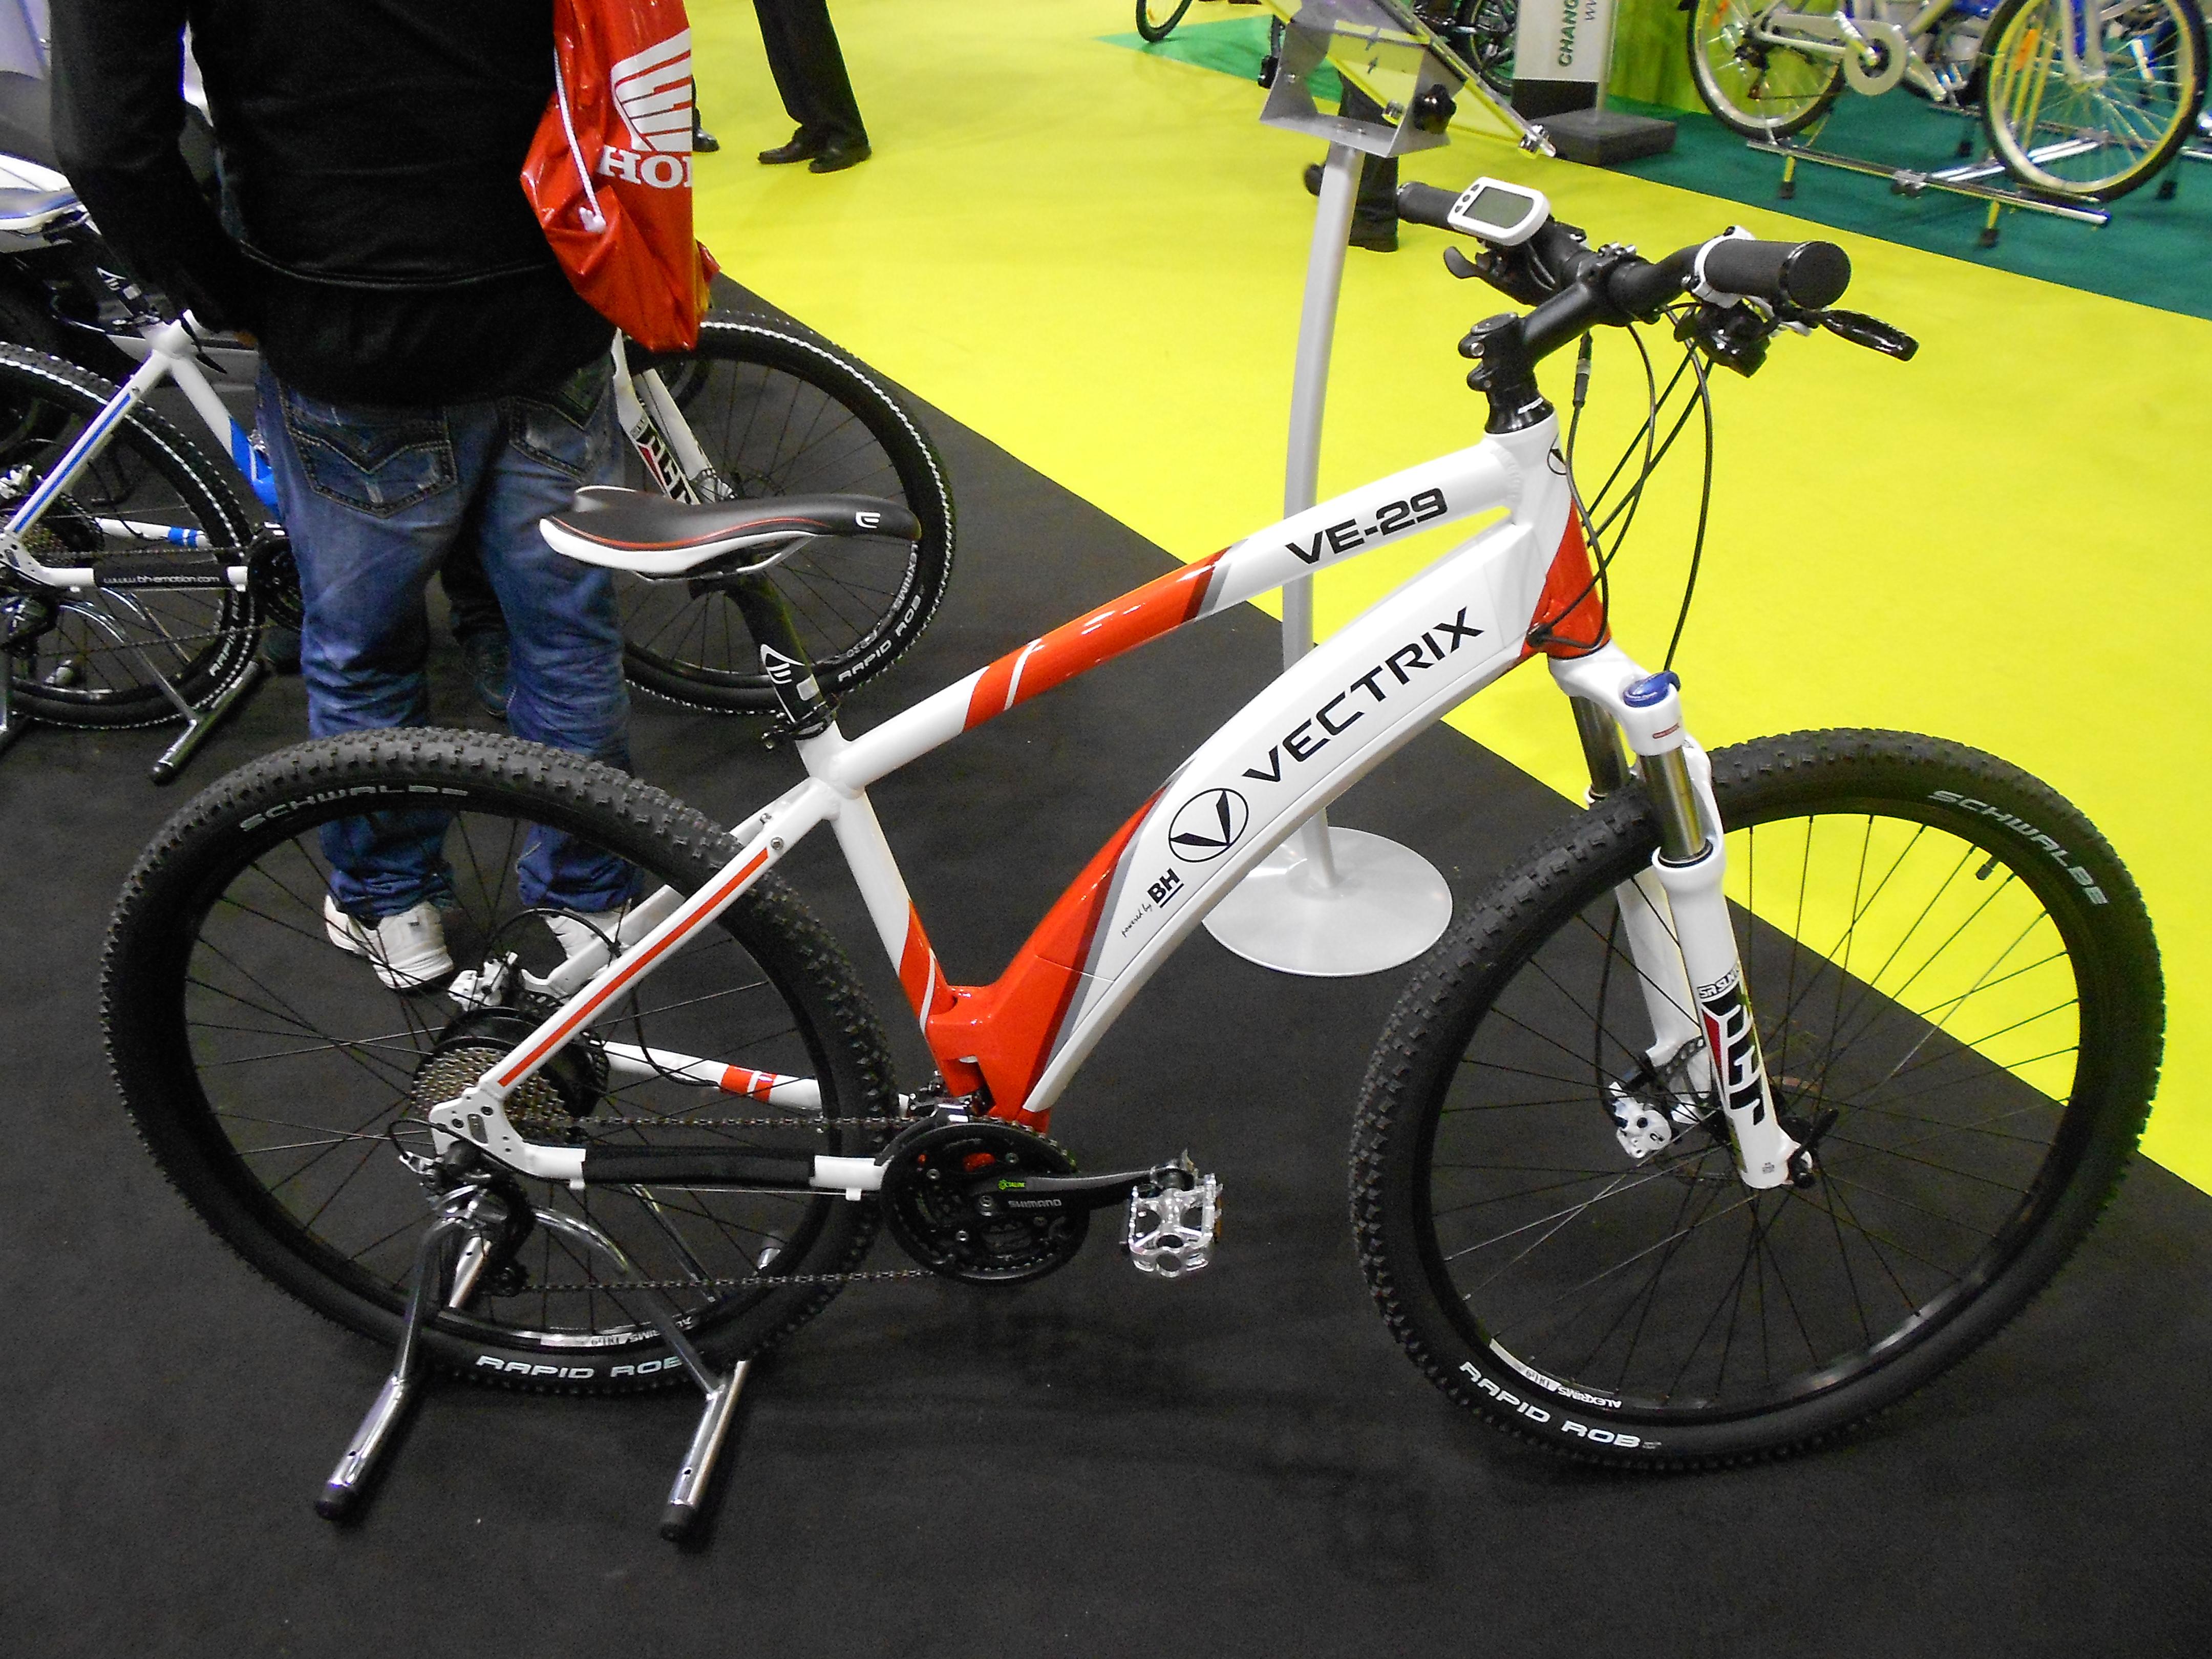 Vectrix e-bike